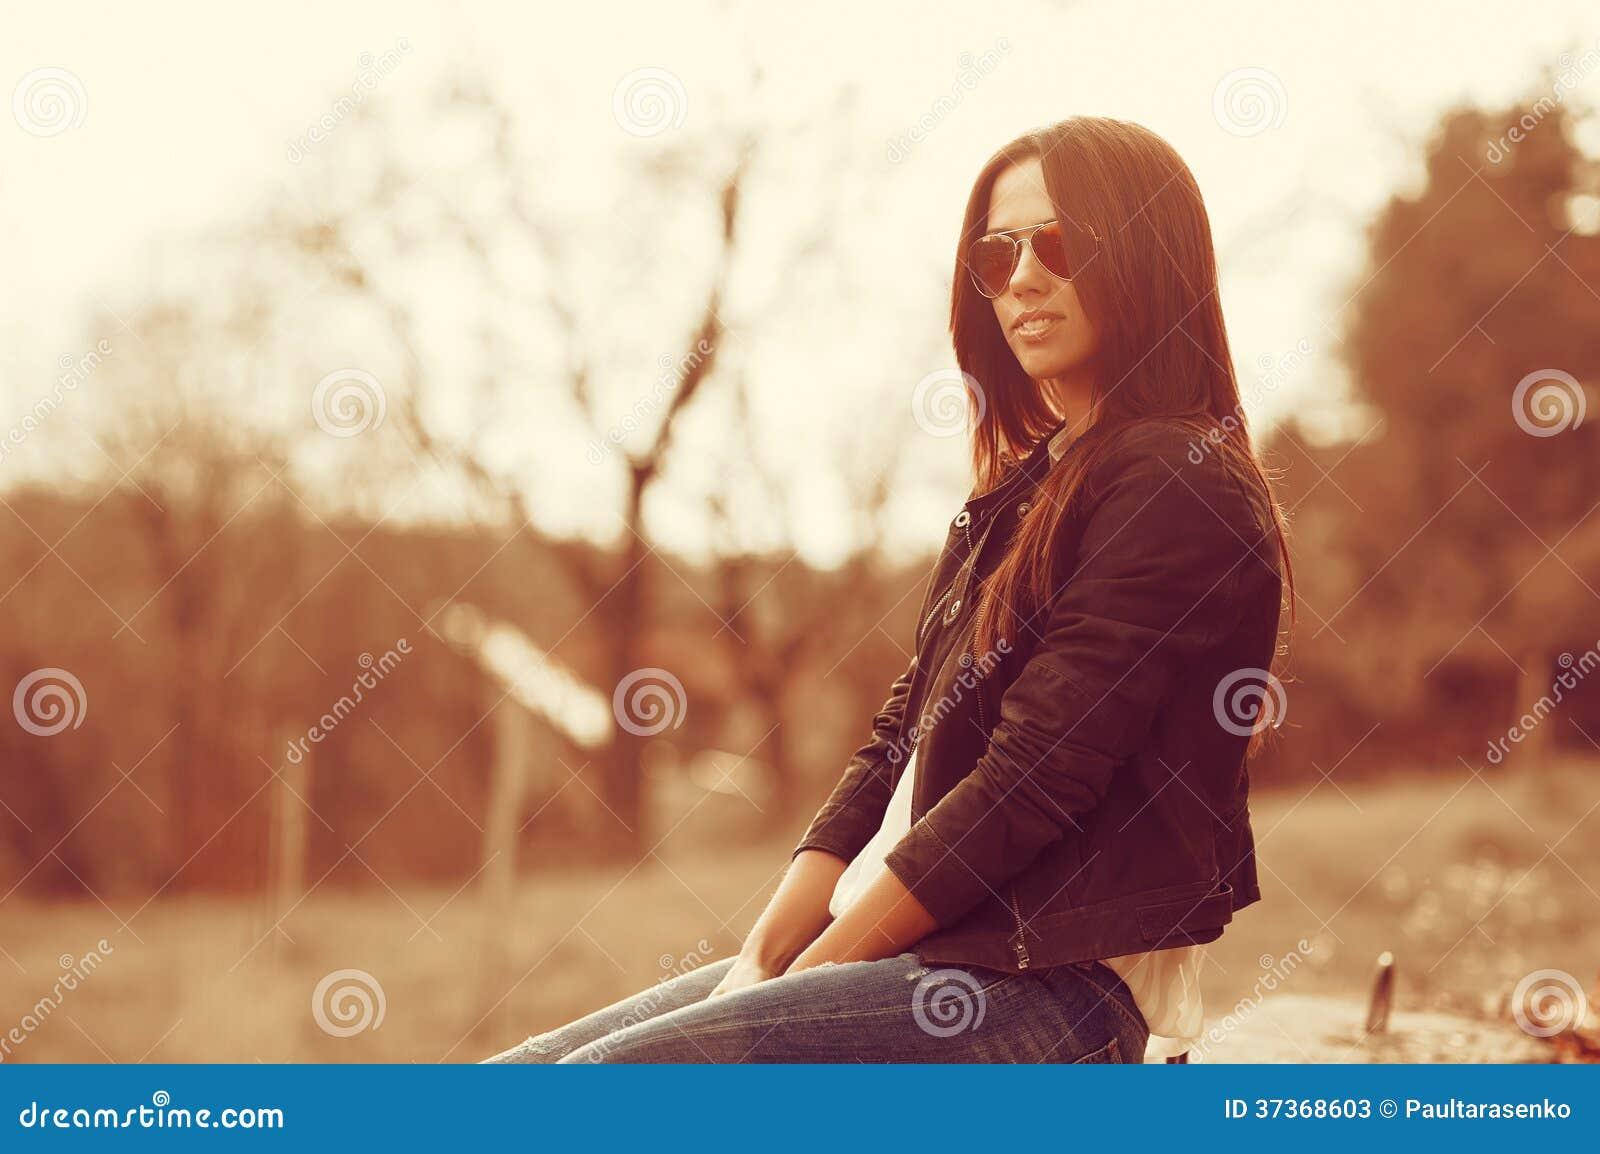 femme de mannequin posant dehors image stock image du charme mode 37368603. Black Bedroom Furniture Sets. Home Design Ideas